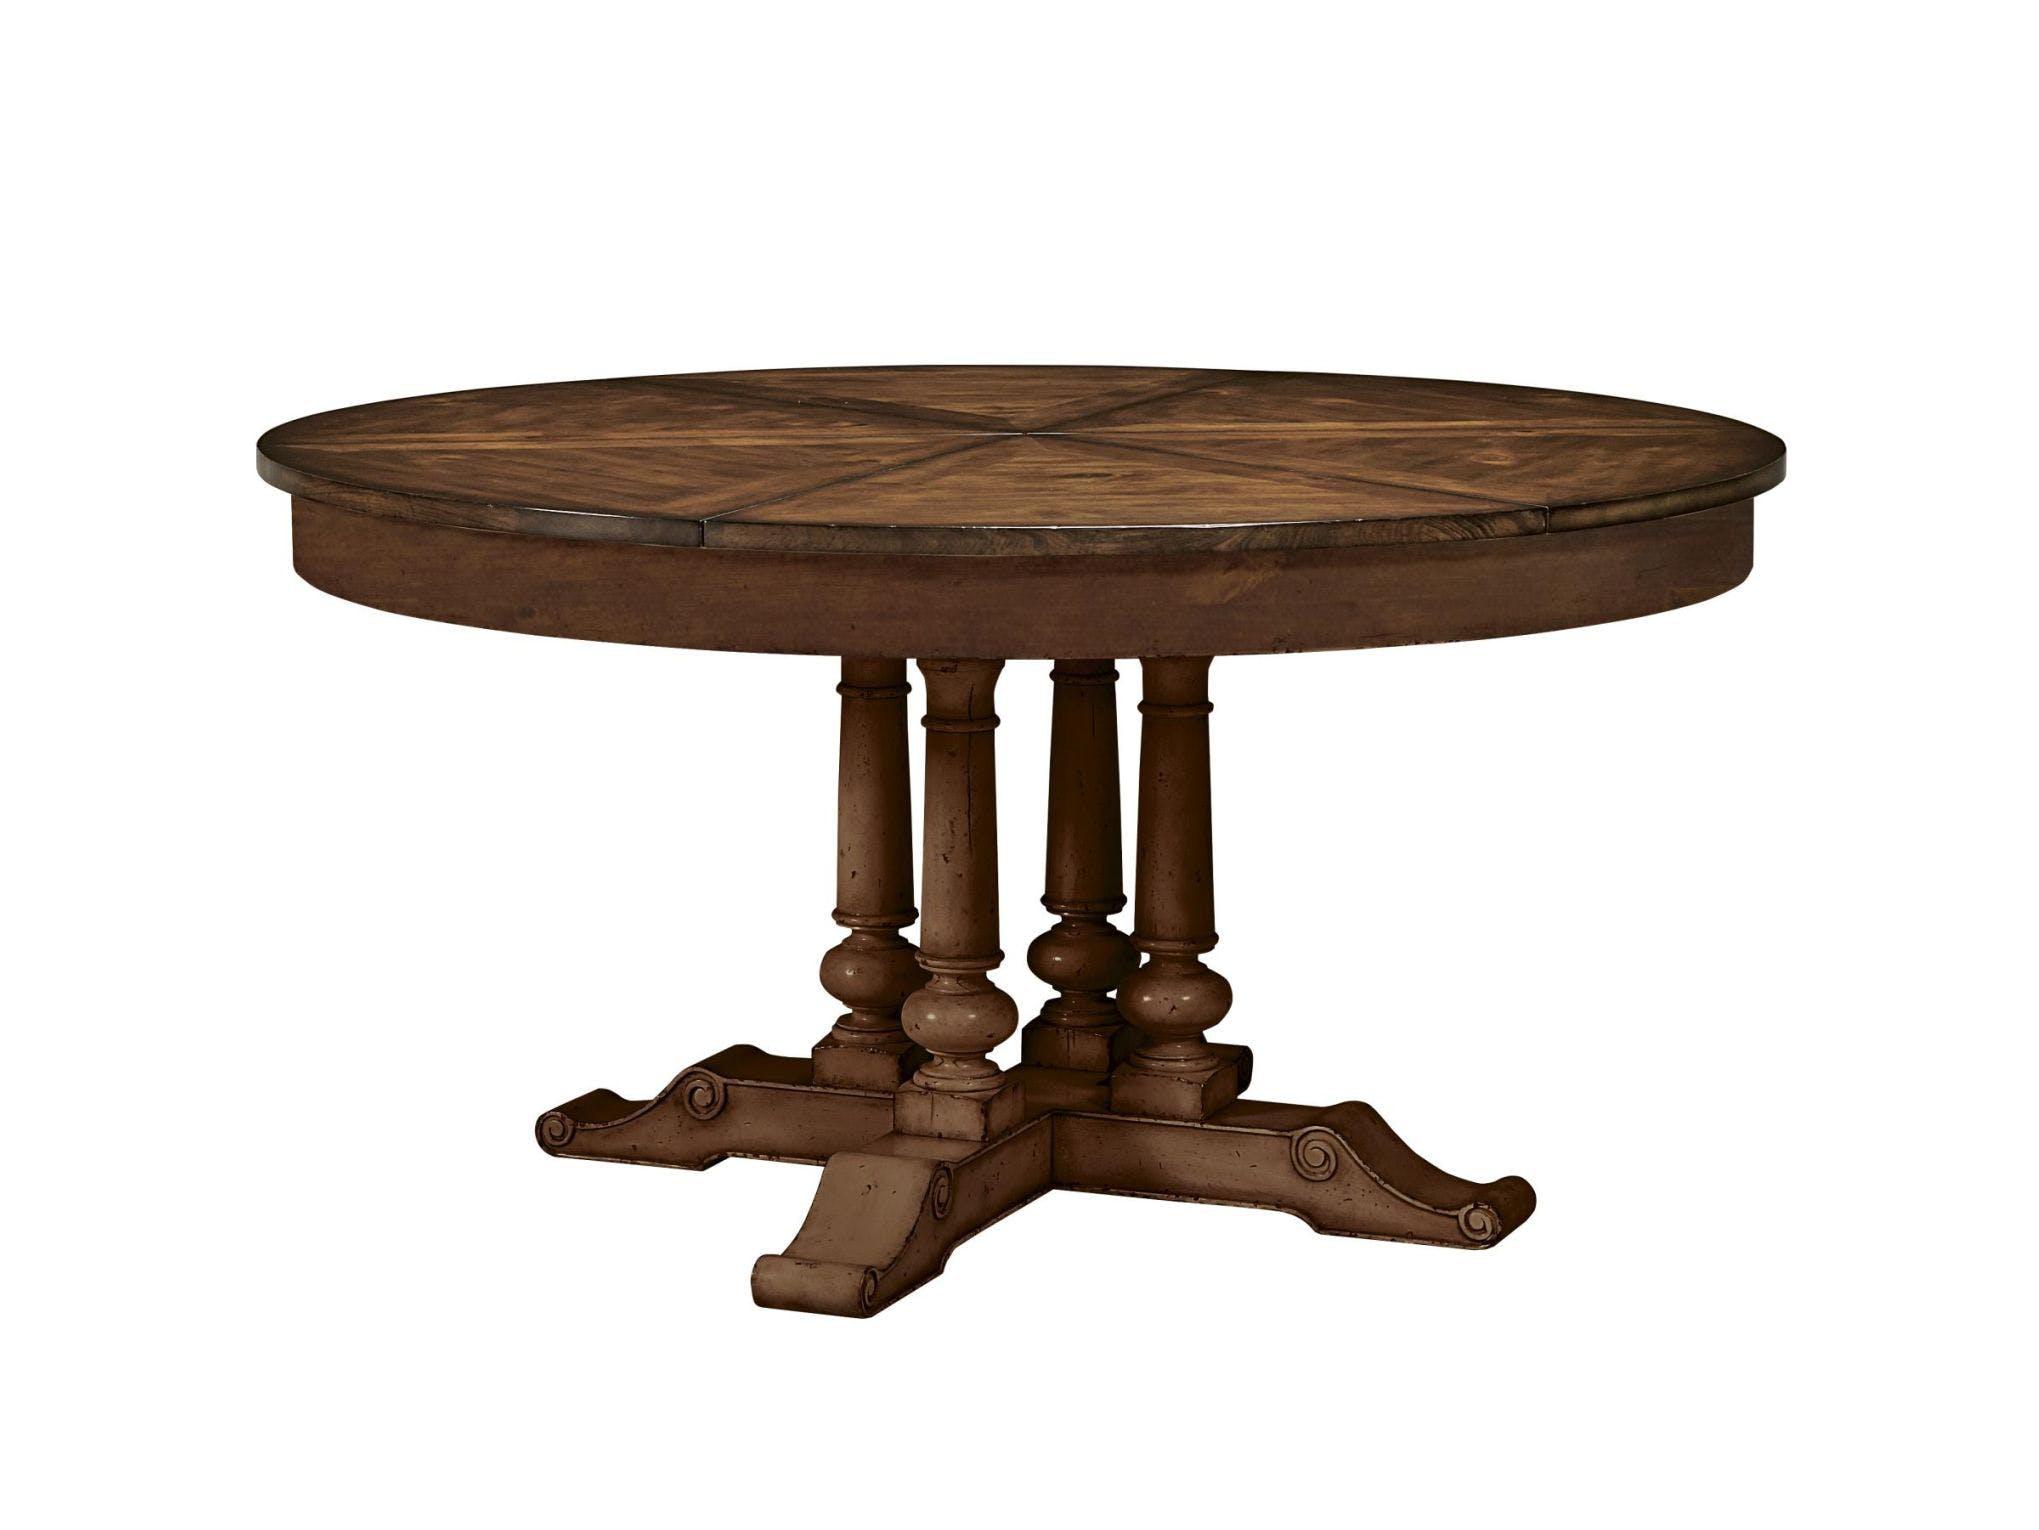 Fine Furniture Design Furniture - Toms-Price Furniture - Chicago suburbs